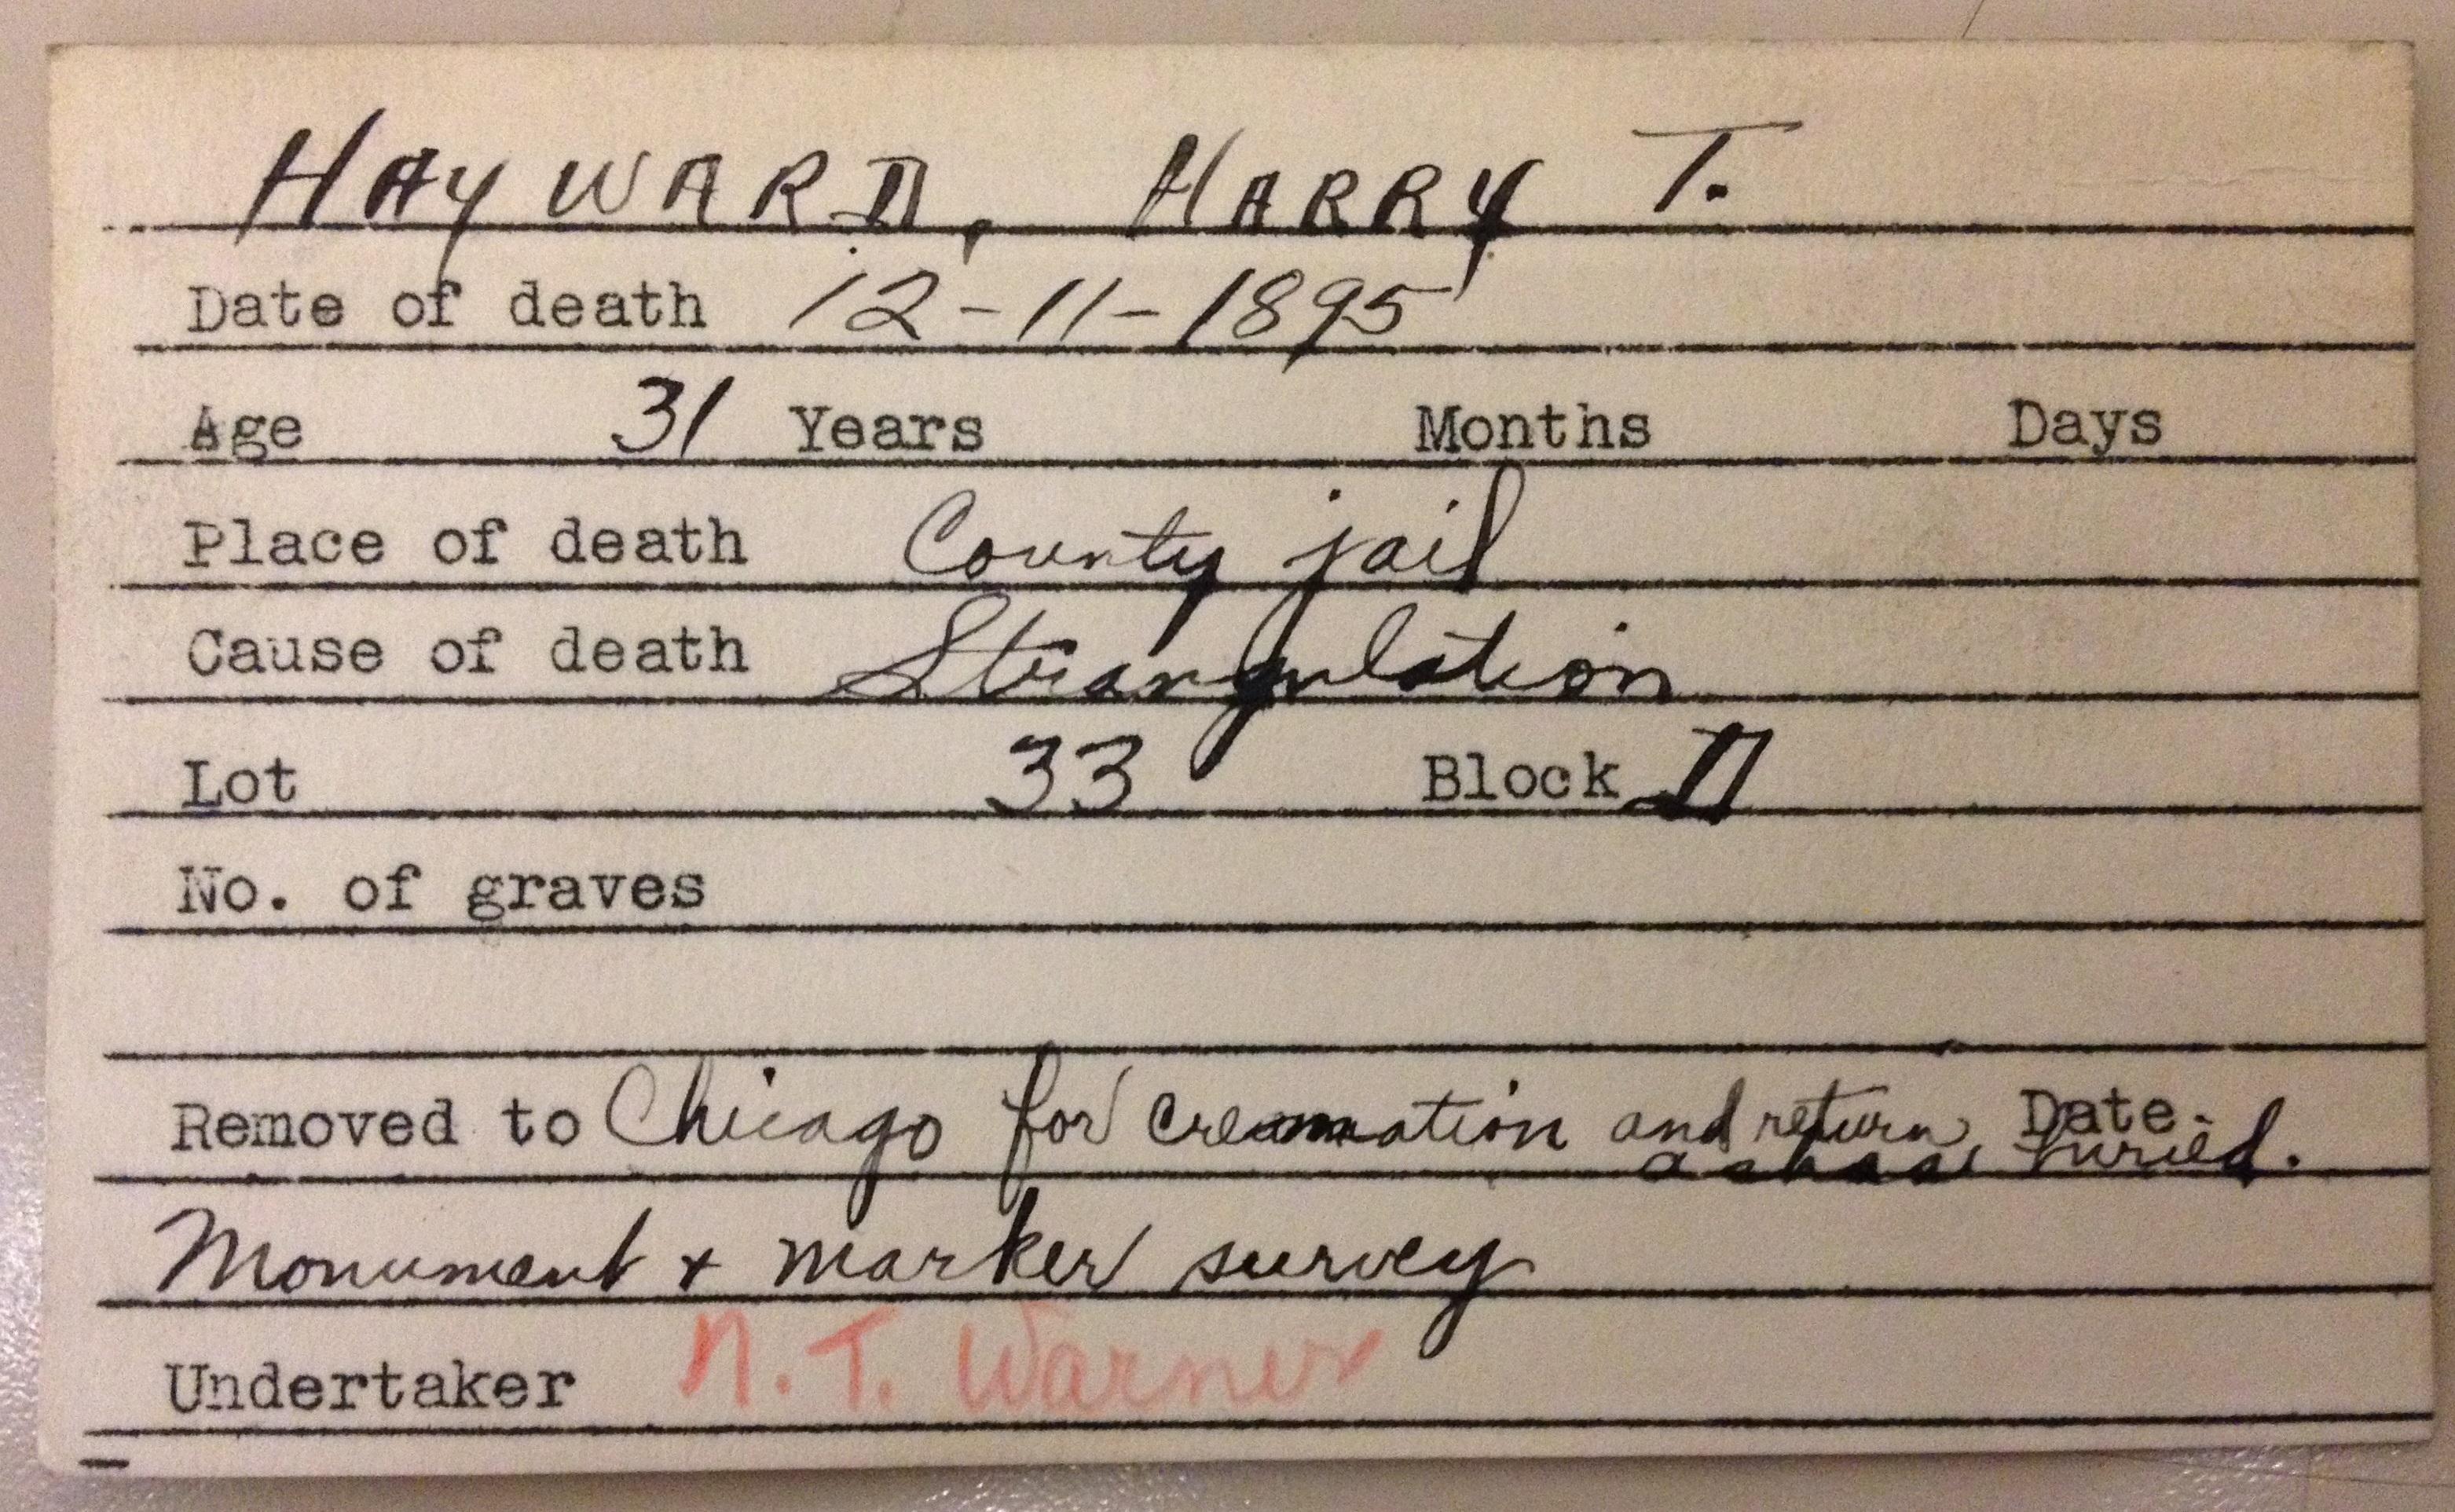 Harry Hayward burial card, soldiers and pioneers cemetery